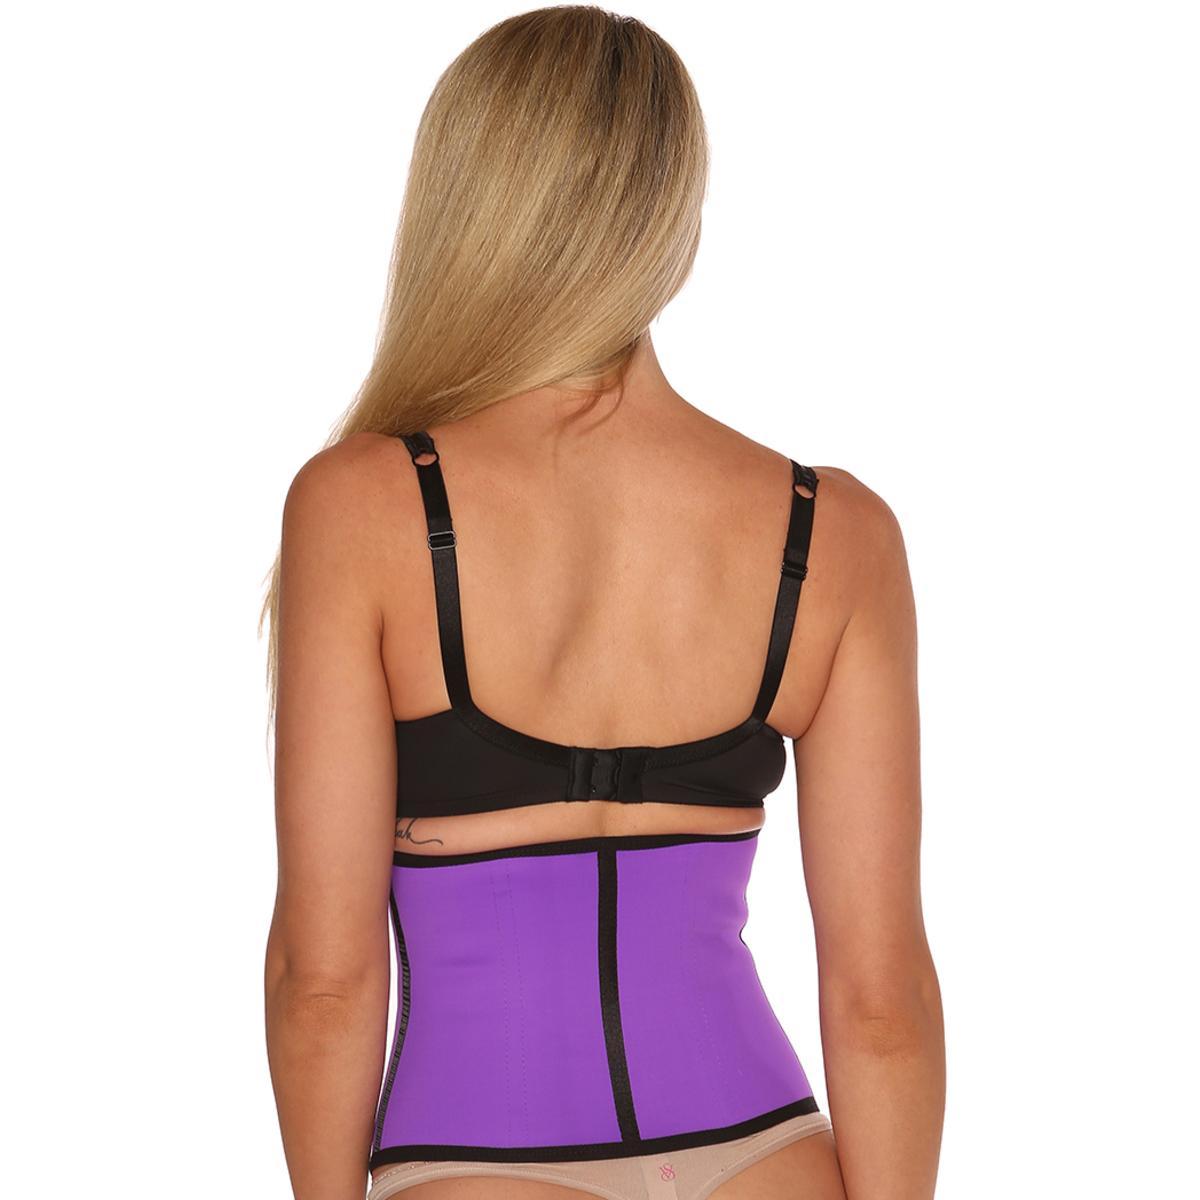 cbdad04526a Flakisima Womens Slimming Boning Adjustable Waist Trainer BHFO 8973 ...